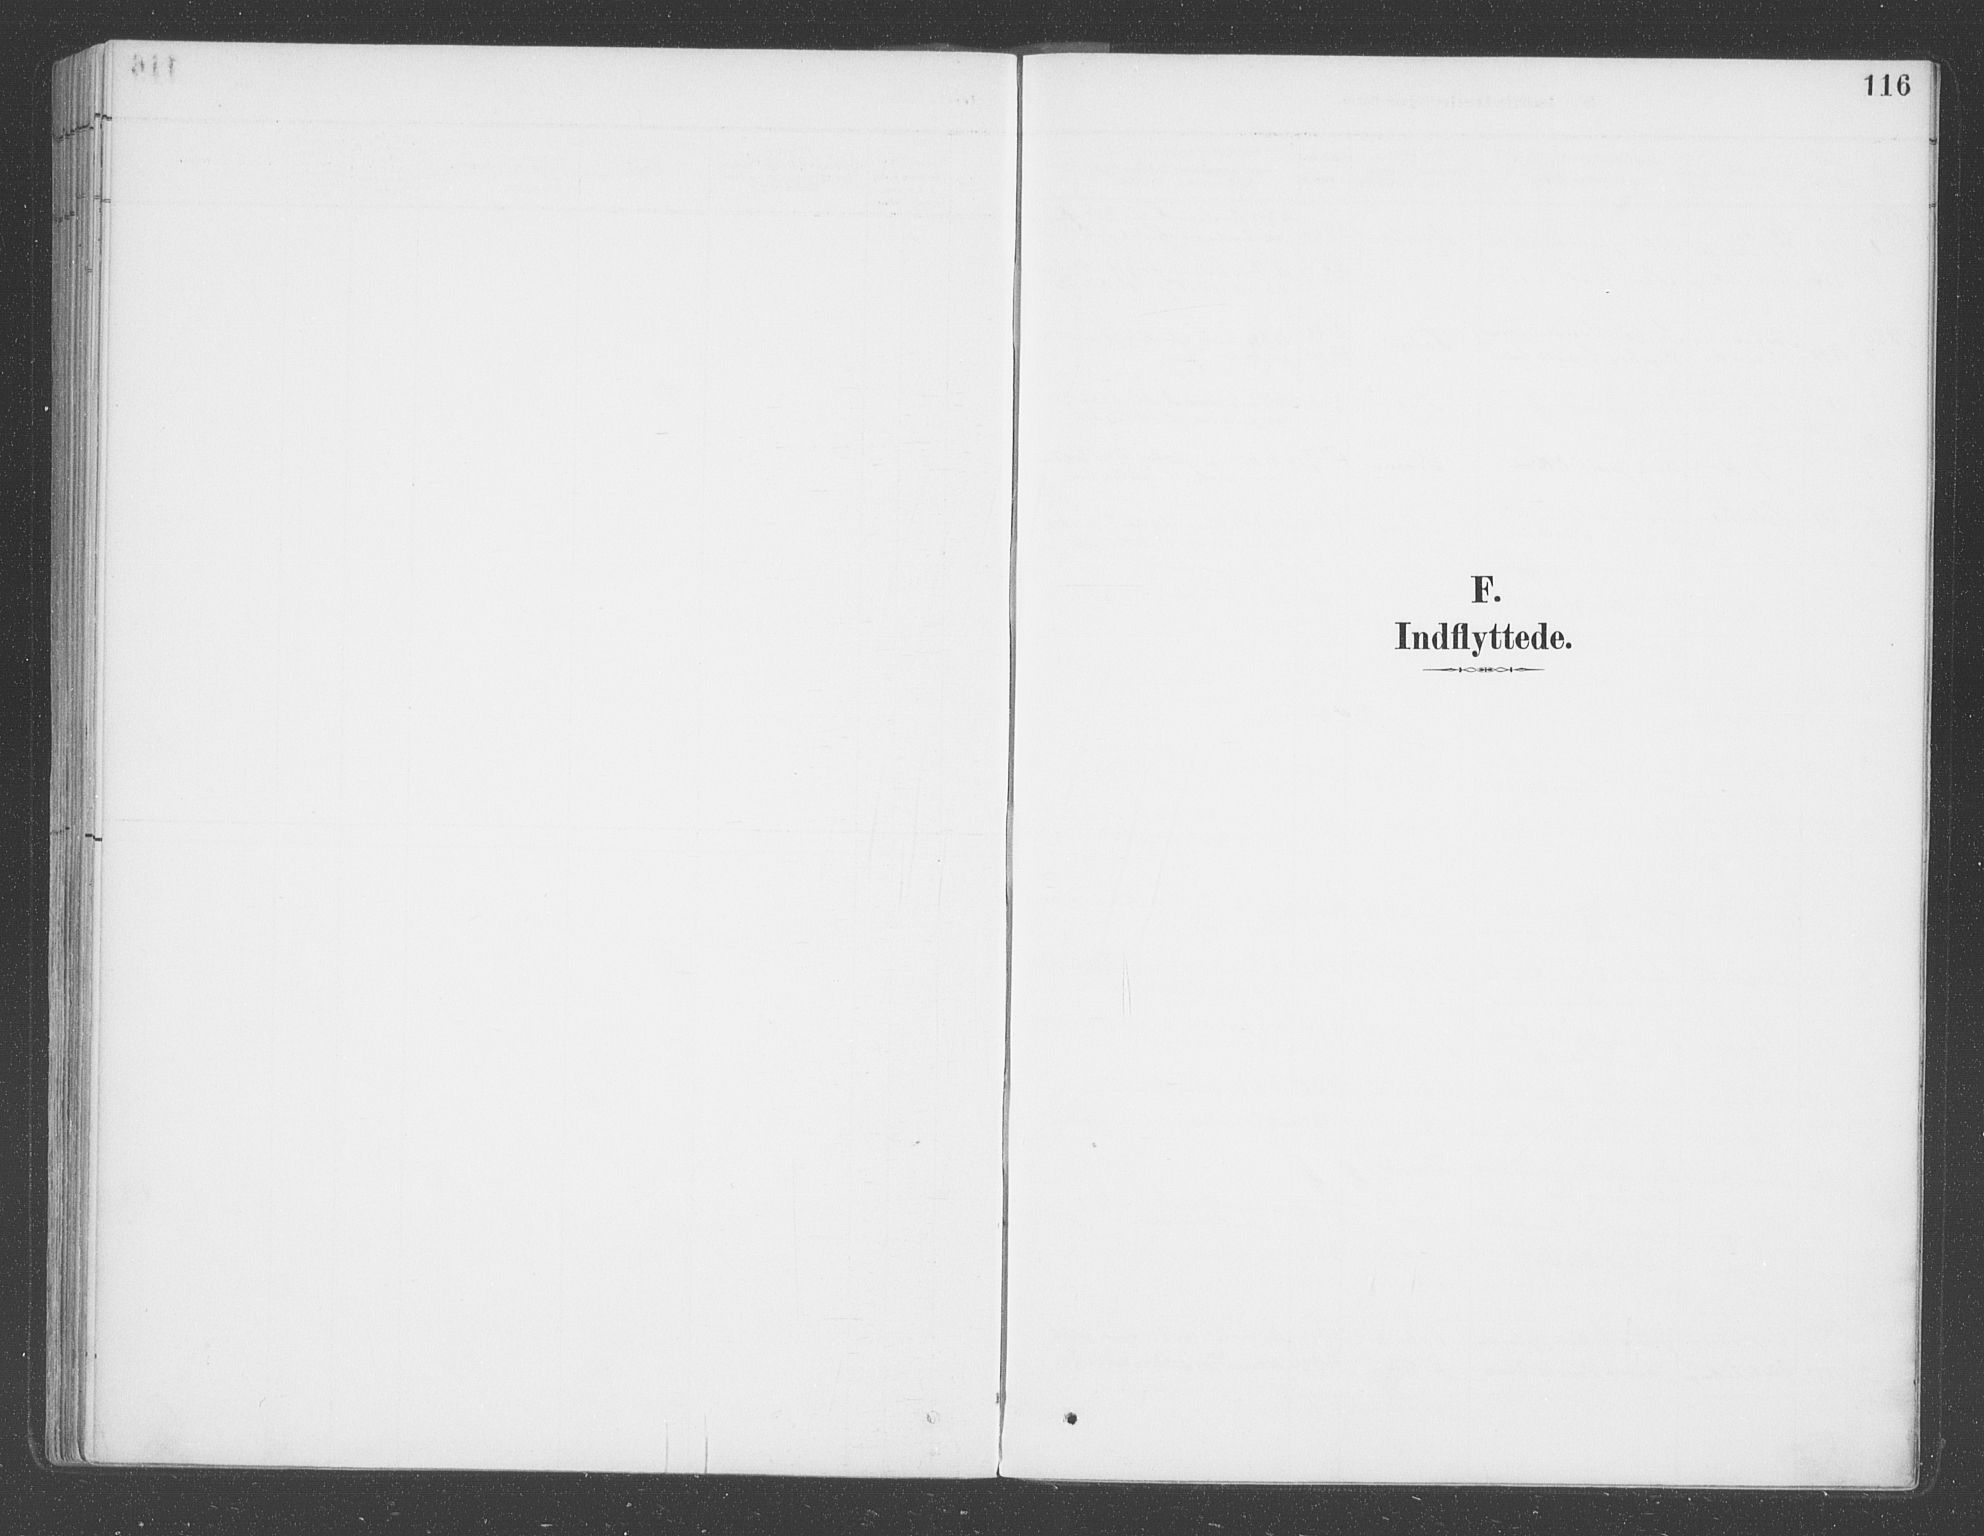 SAB, Balestrand sokneprestembete, H/Haa/Haab/L0001: Ministerialbok nr. B  1, 1889-1910, s. 116